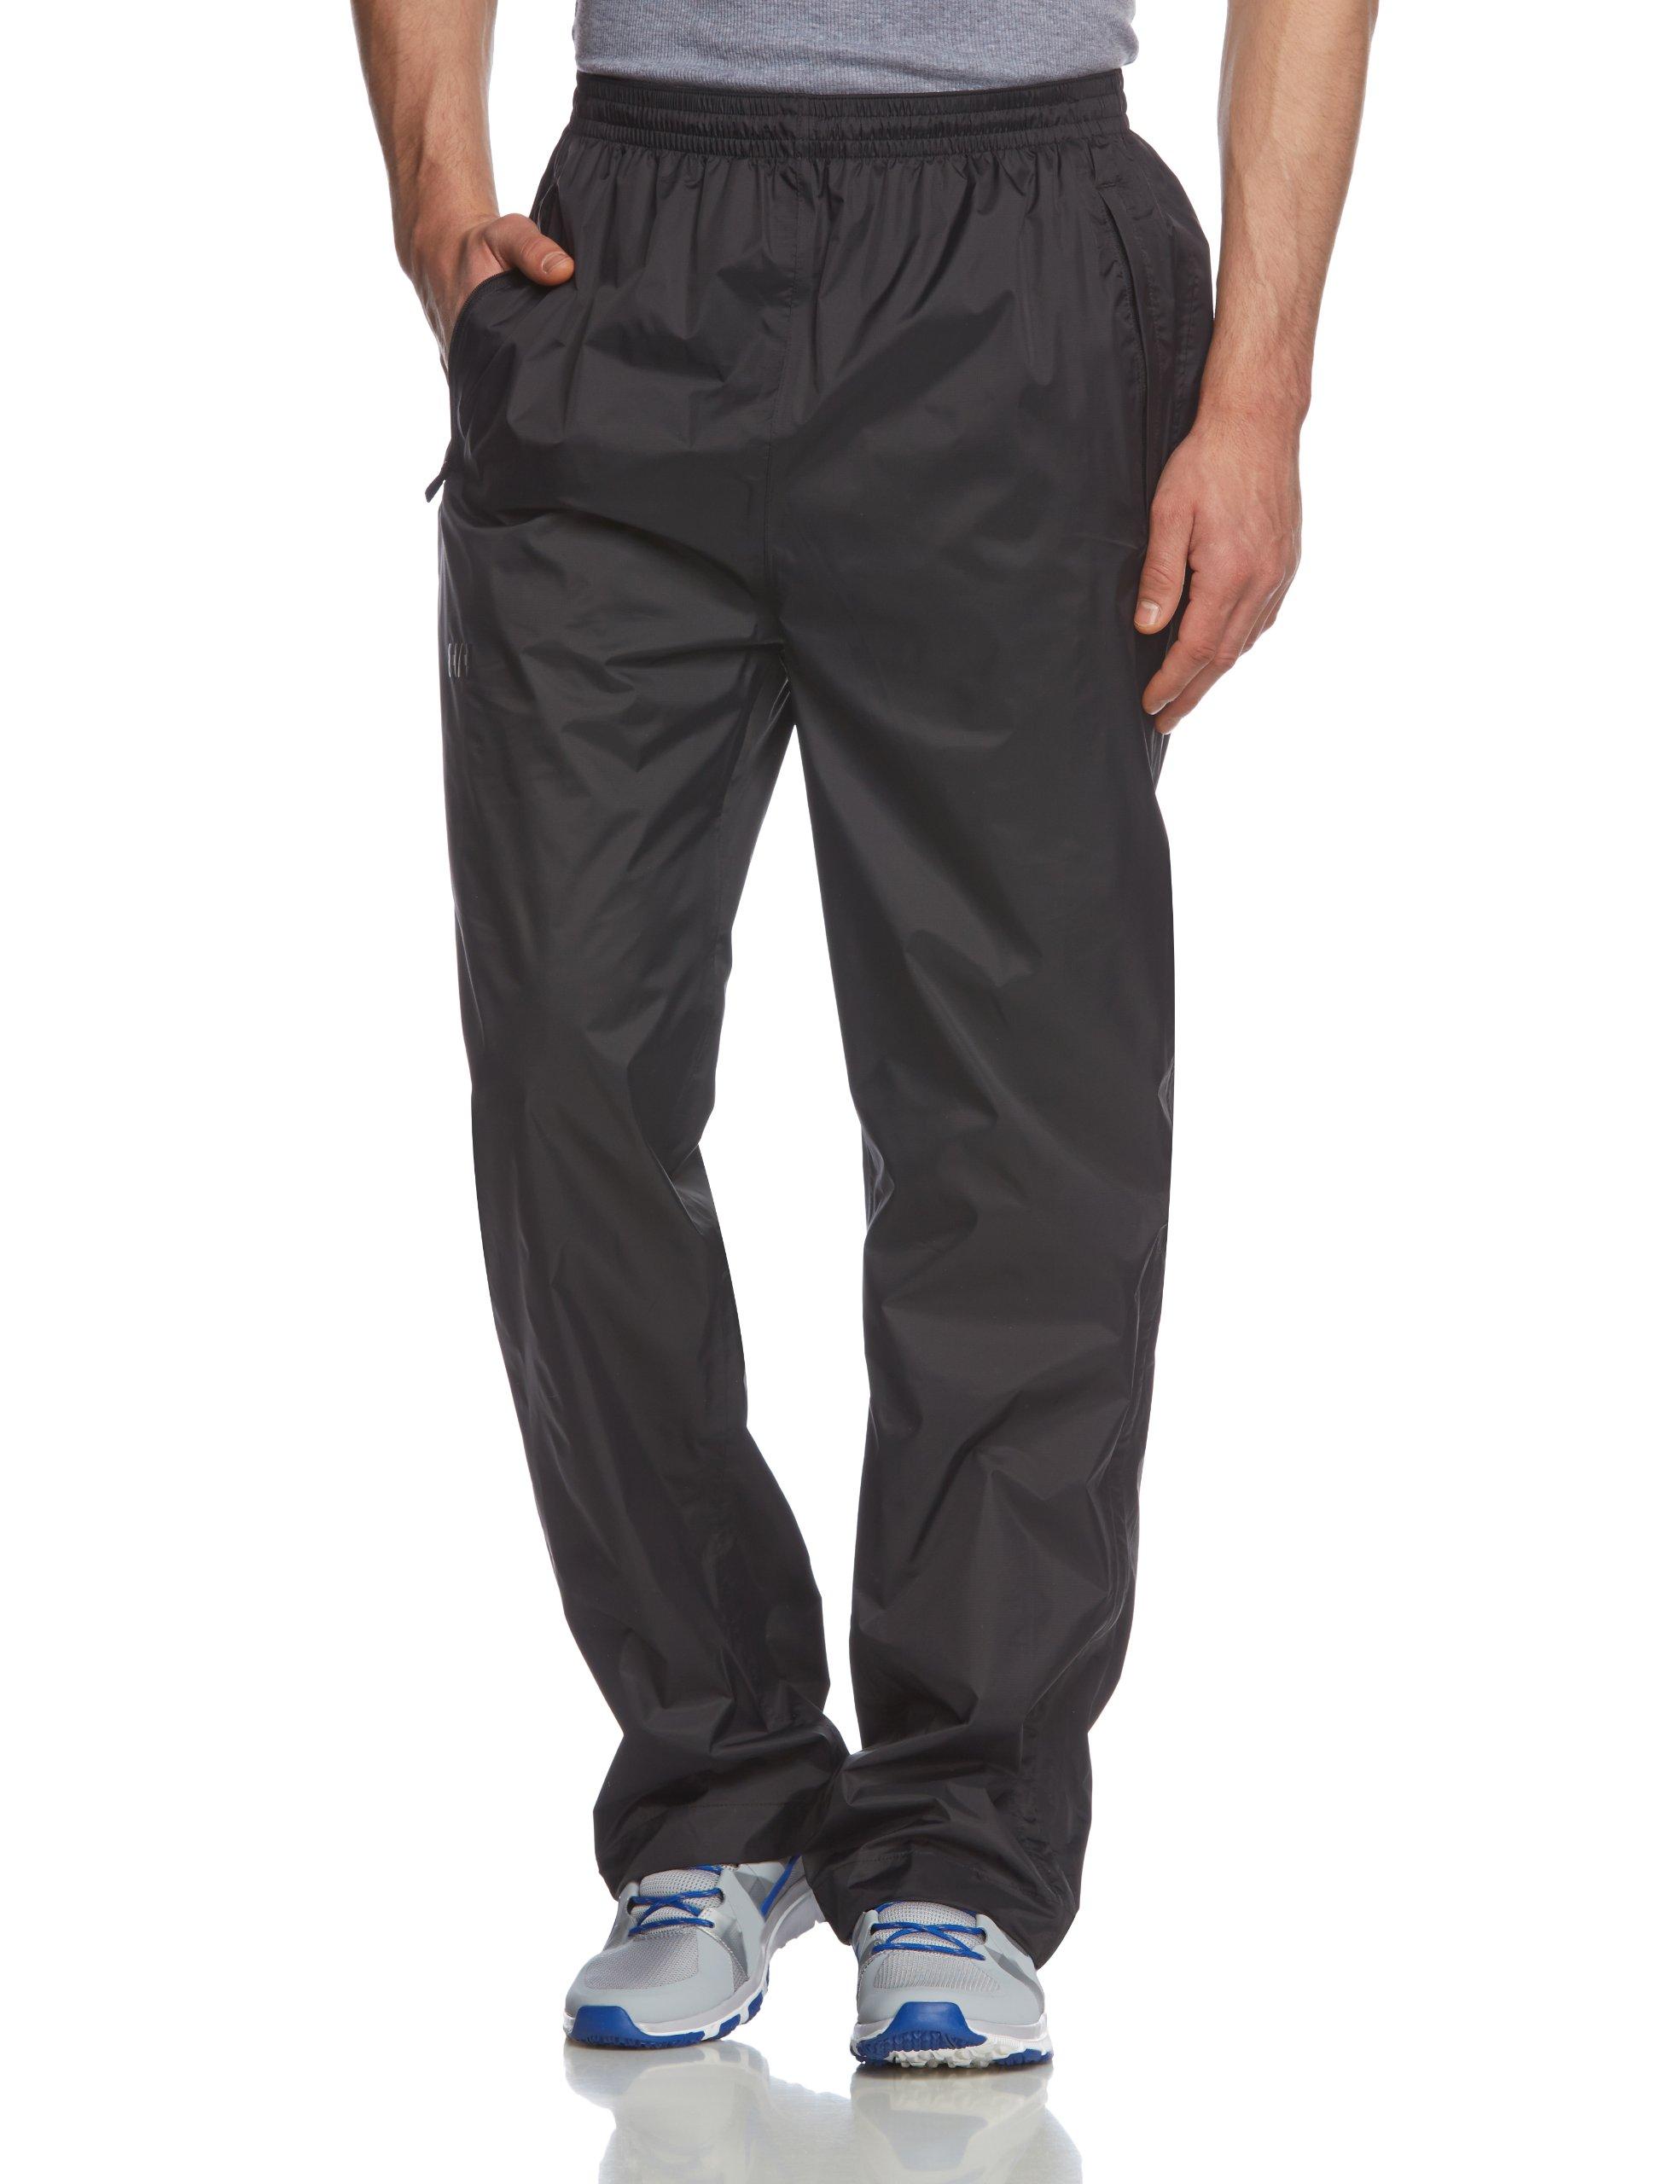 Helly Hansen Men's Loke Pants, Black, Medium